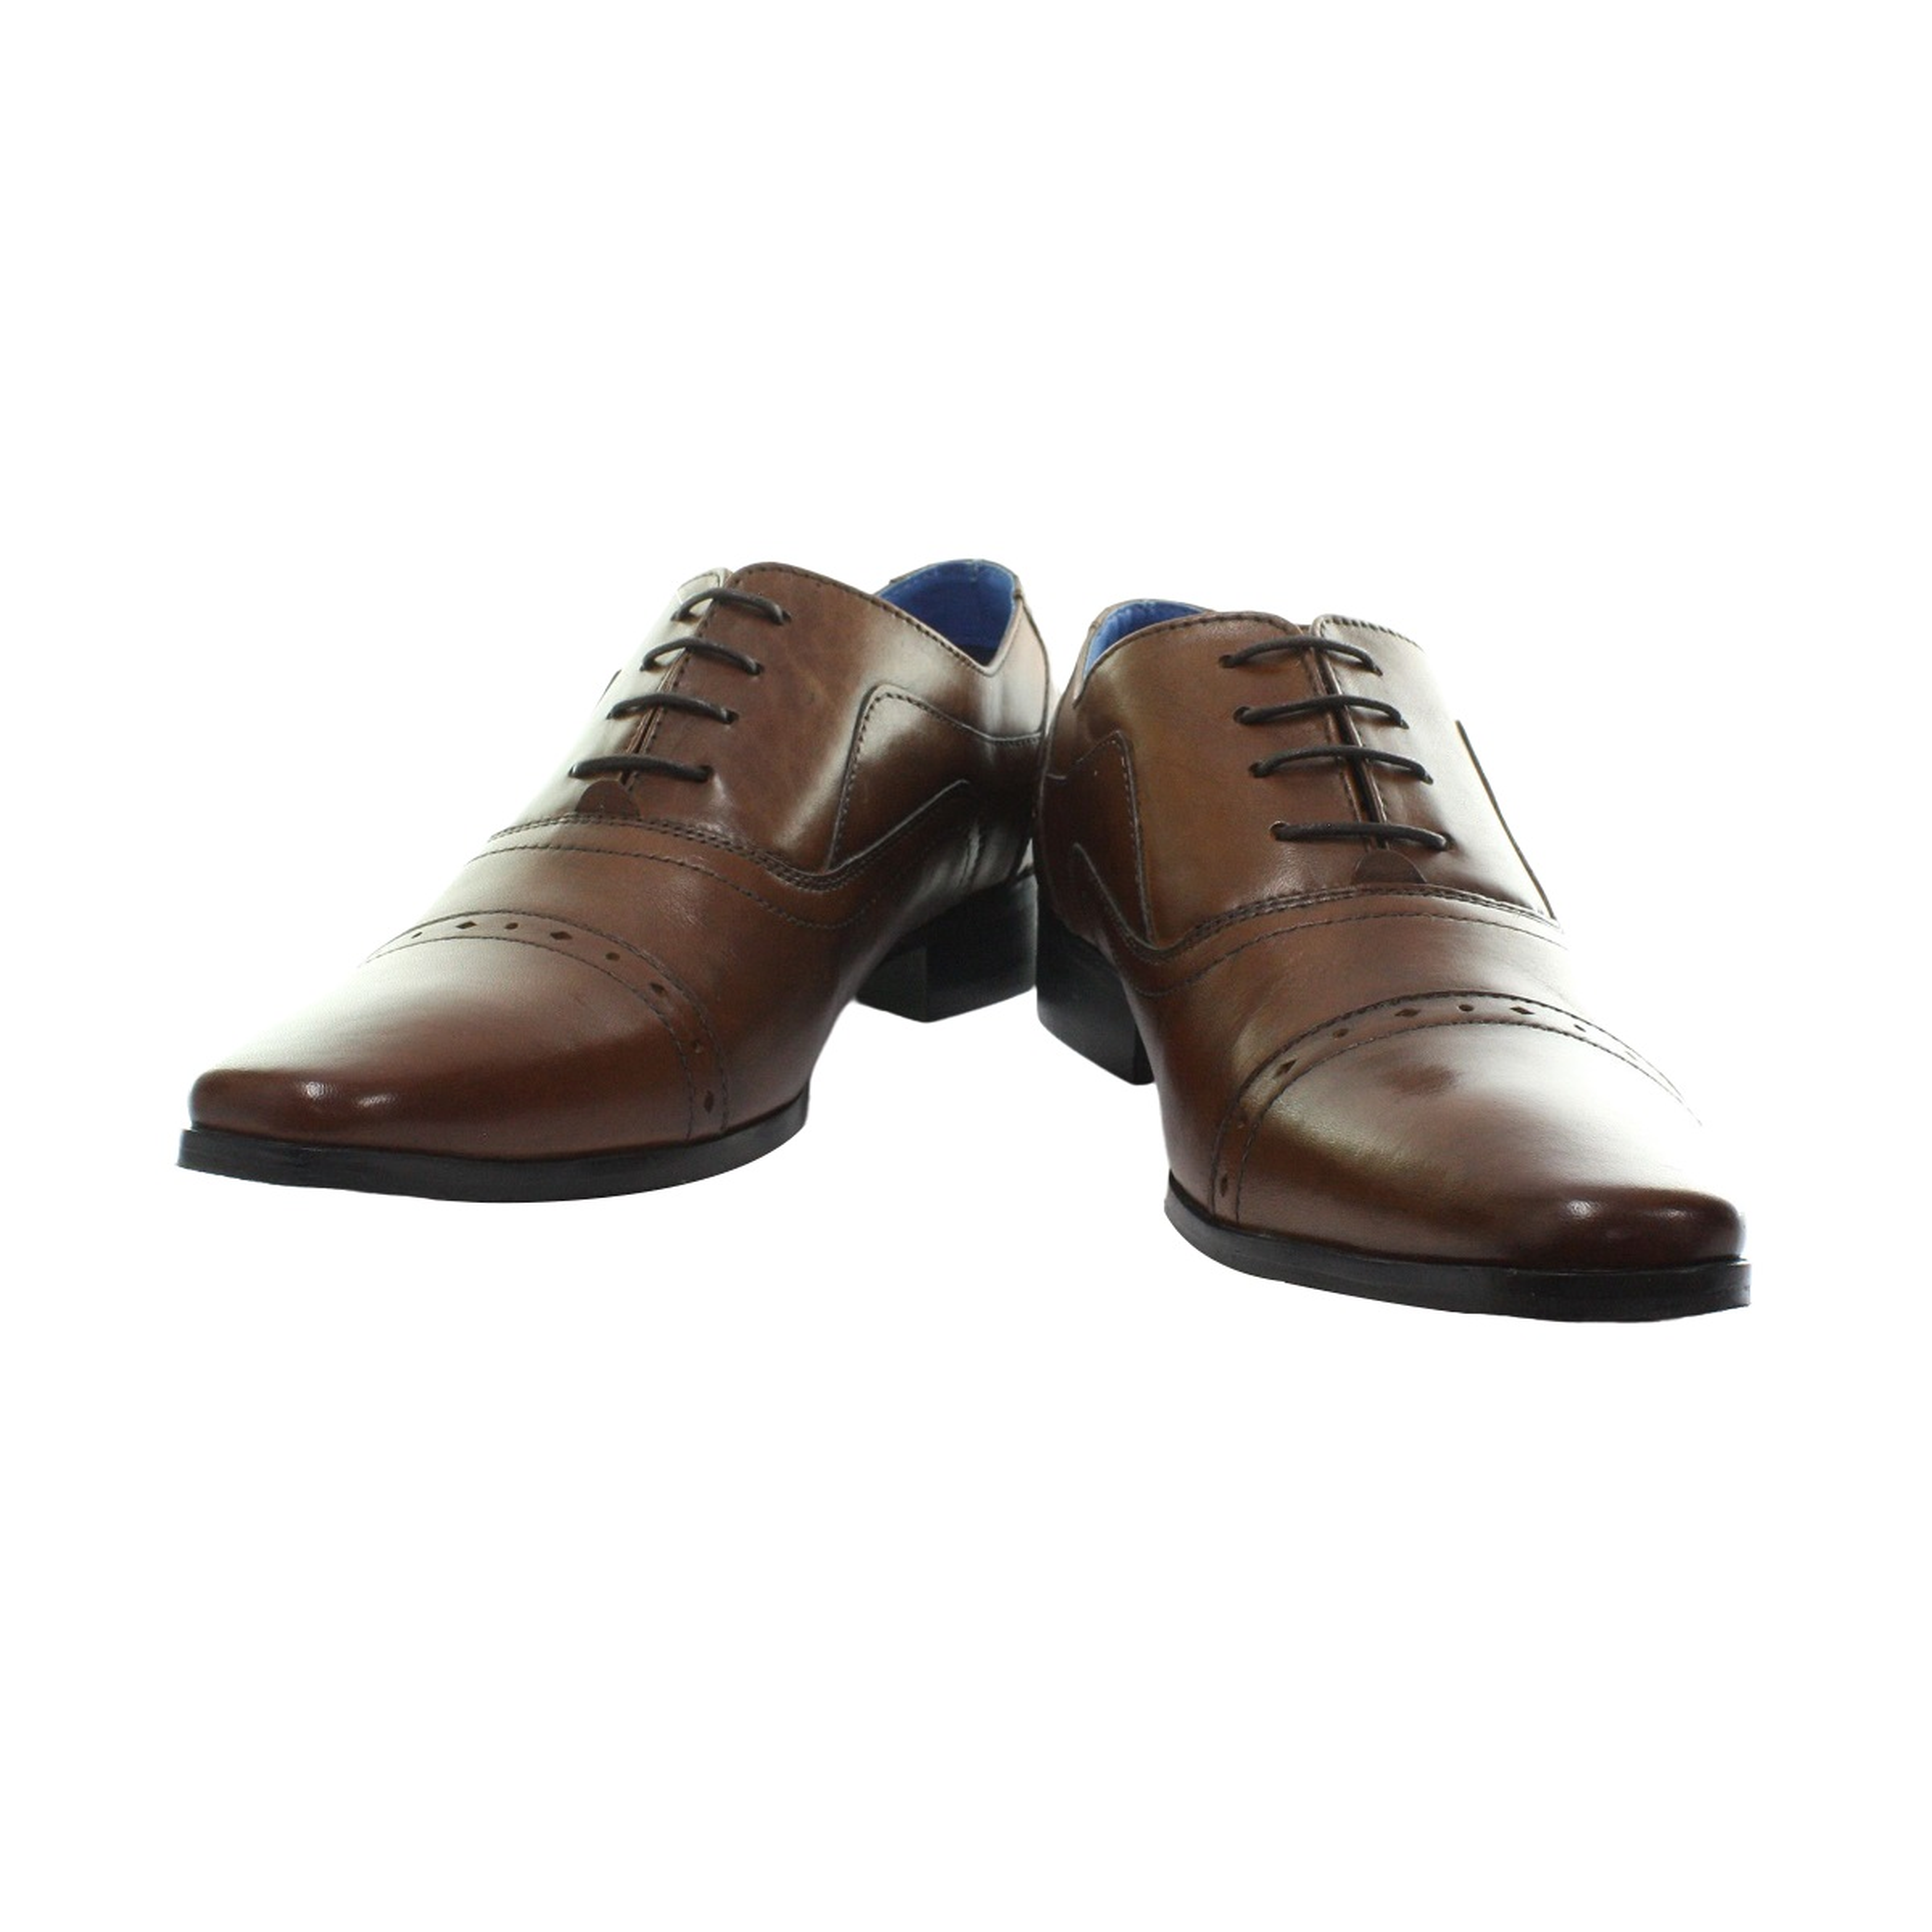 Roamers Cap Herren 5 Ösen Punch Cap Roamers Leder Oxford Schuhe (DF1314) 292803